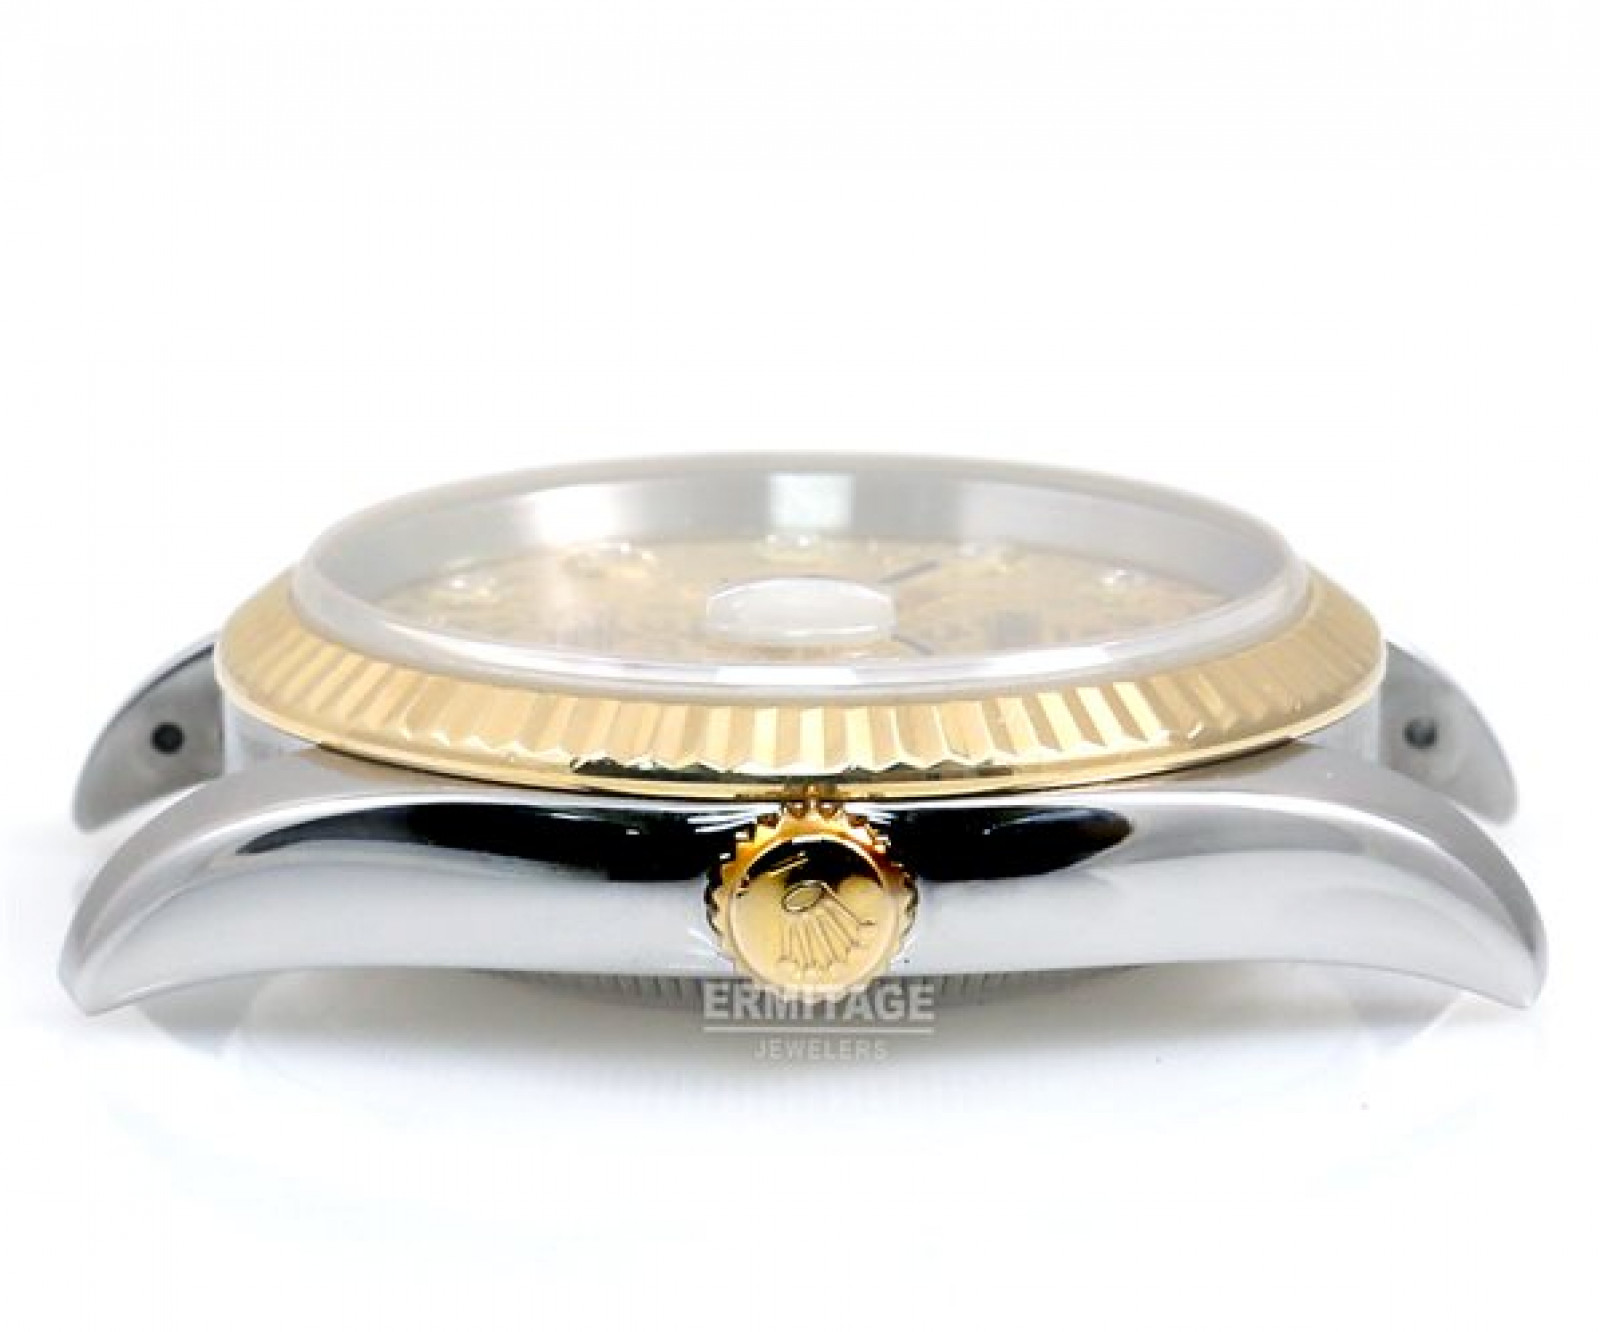 Diamond Dial Rolex Datejust 116233